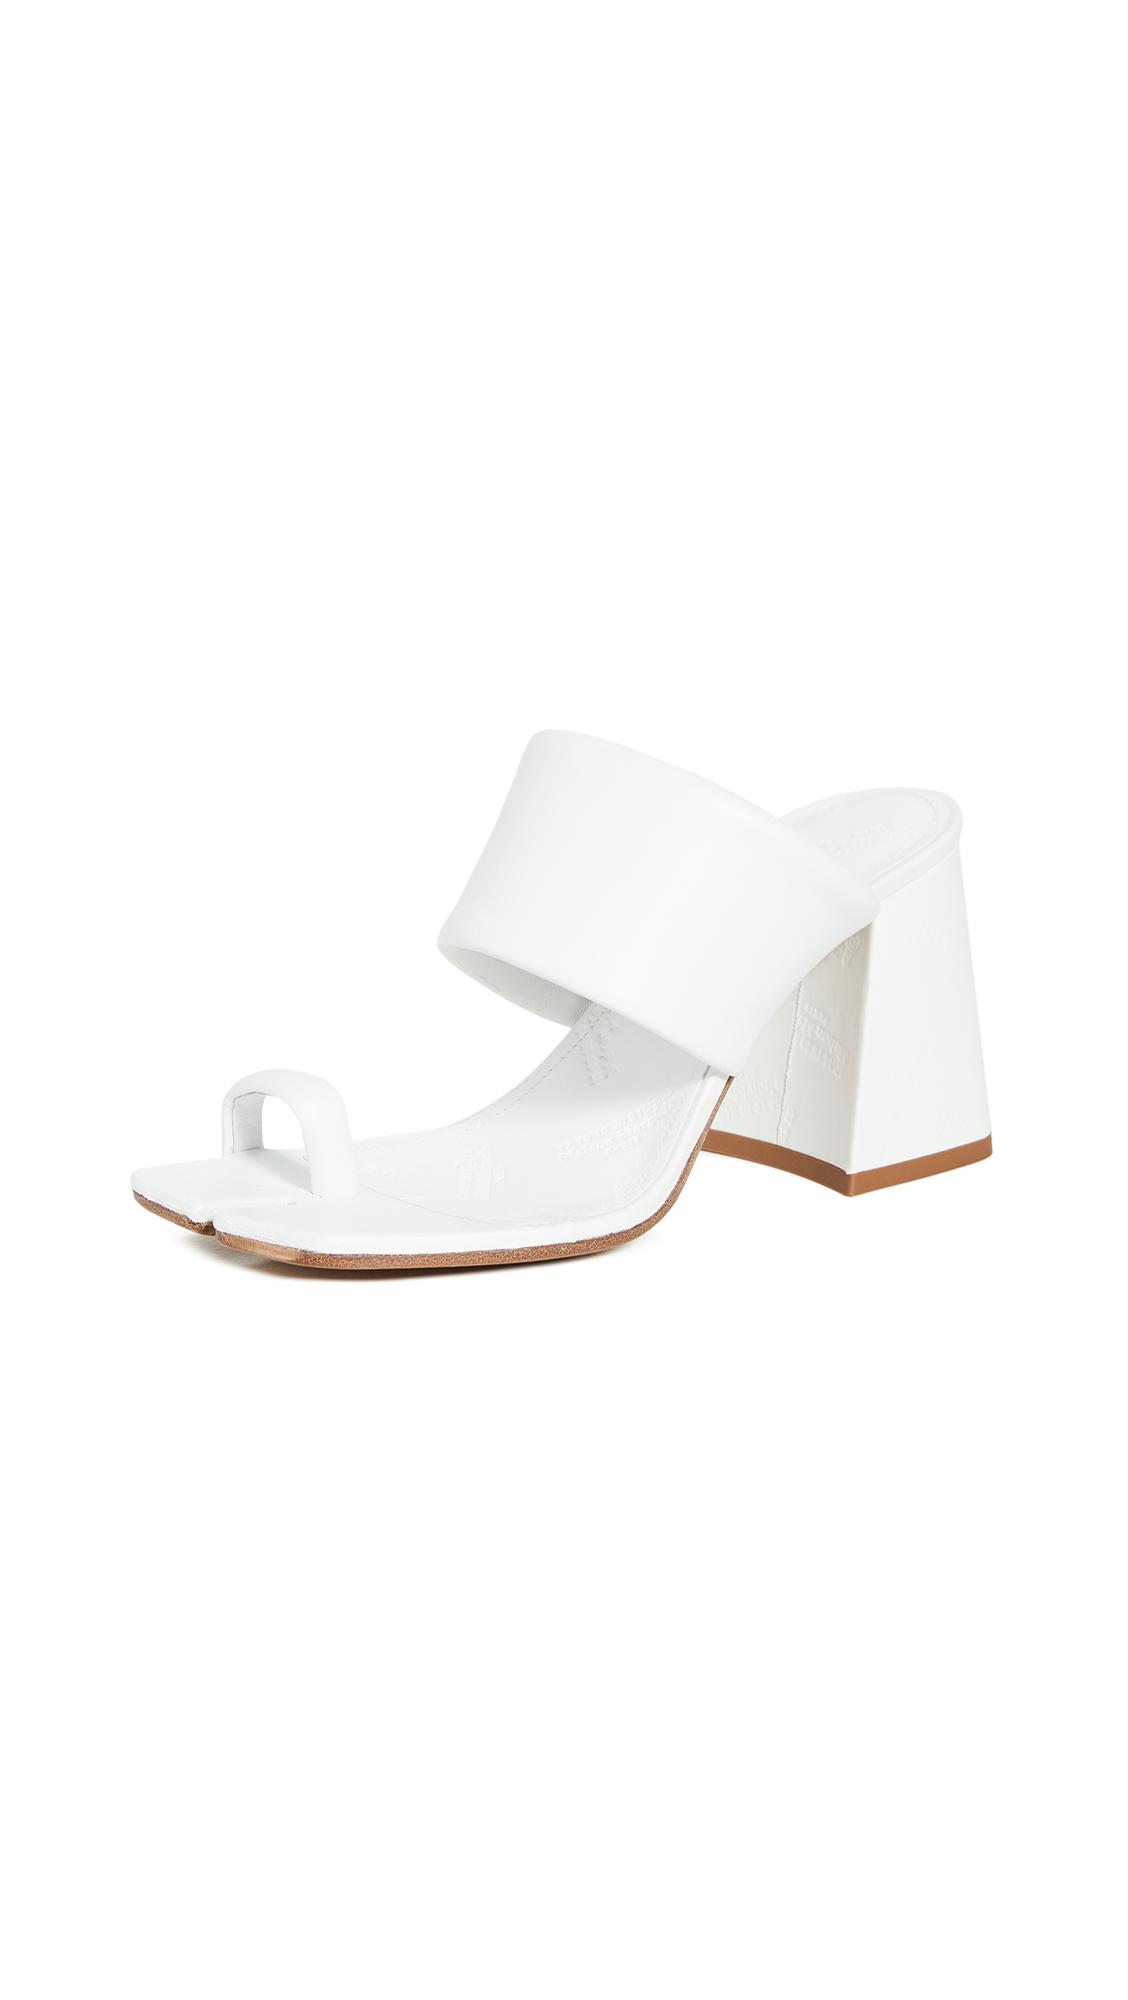 Maison Margiela Chunky High Heeled Sandals - 60% Off Sale